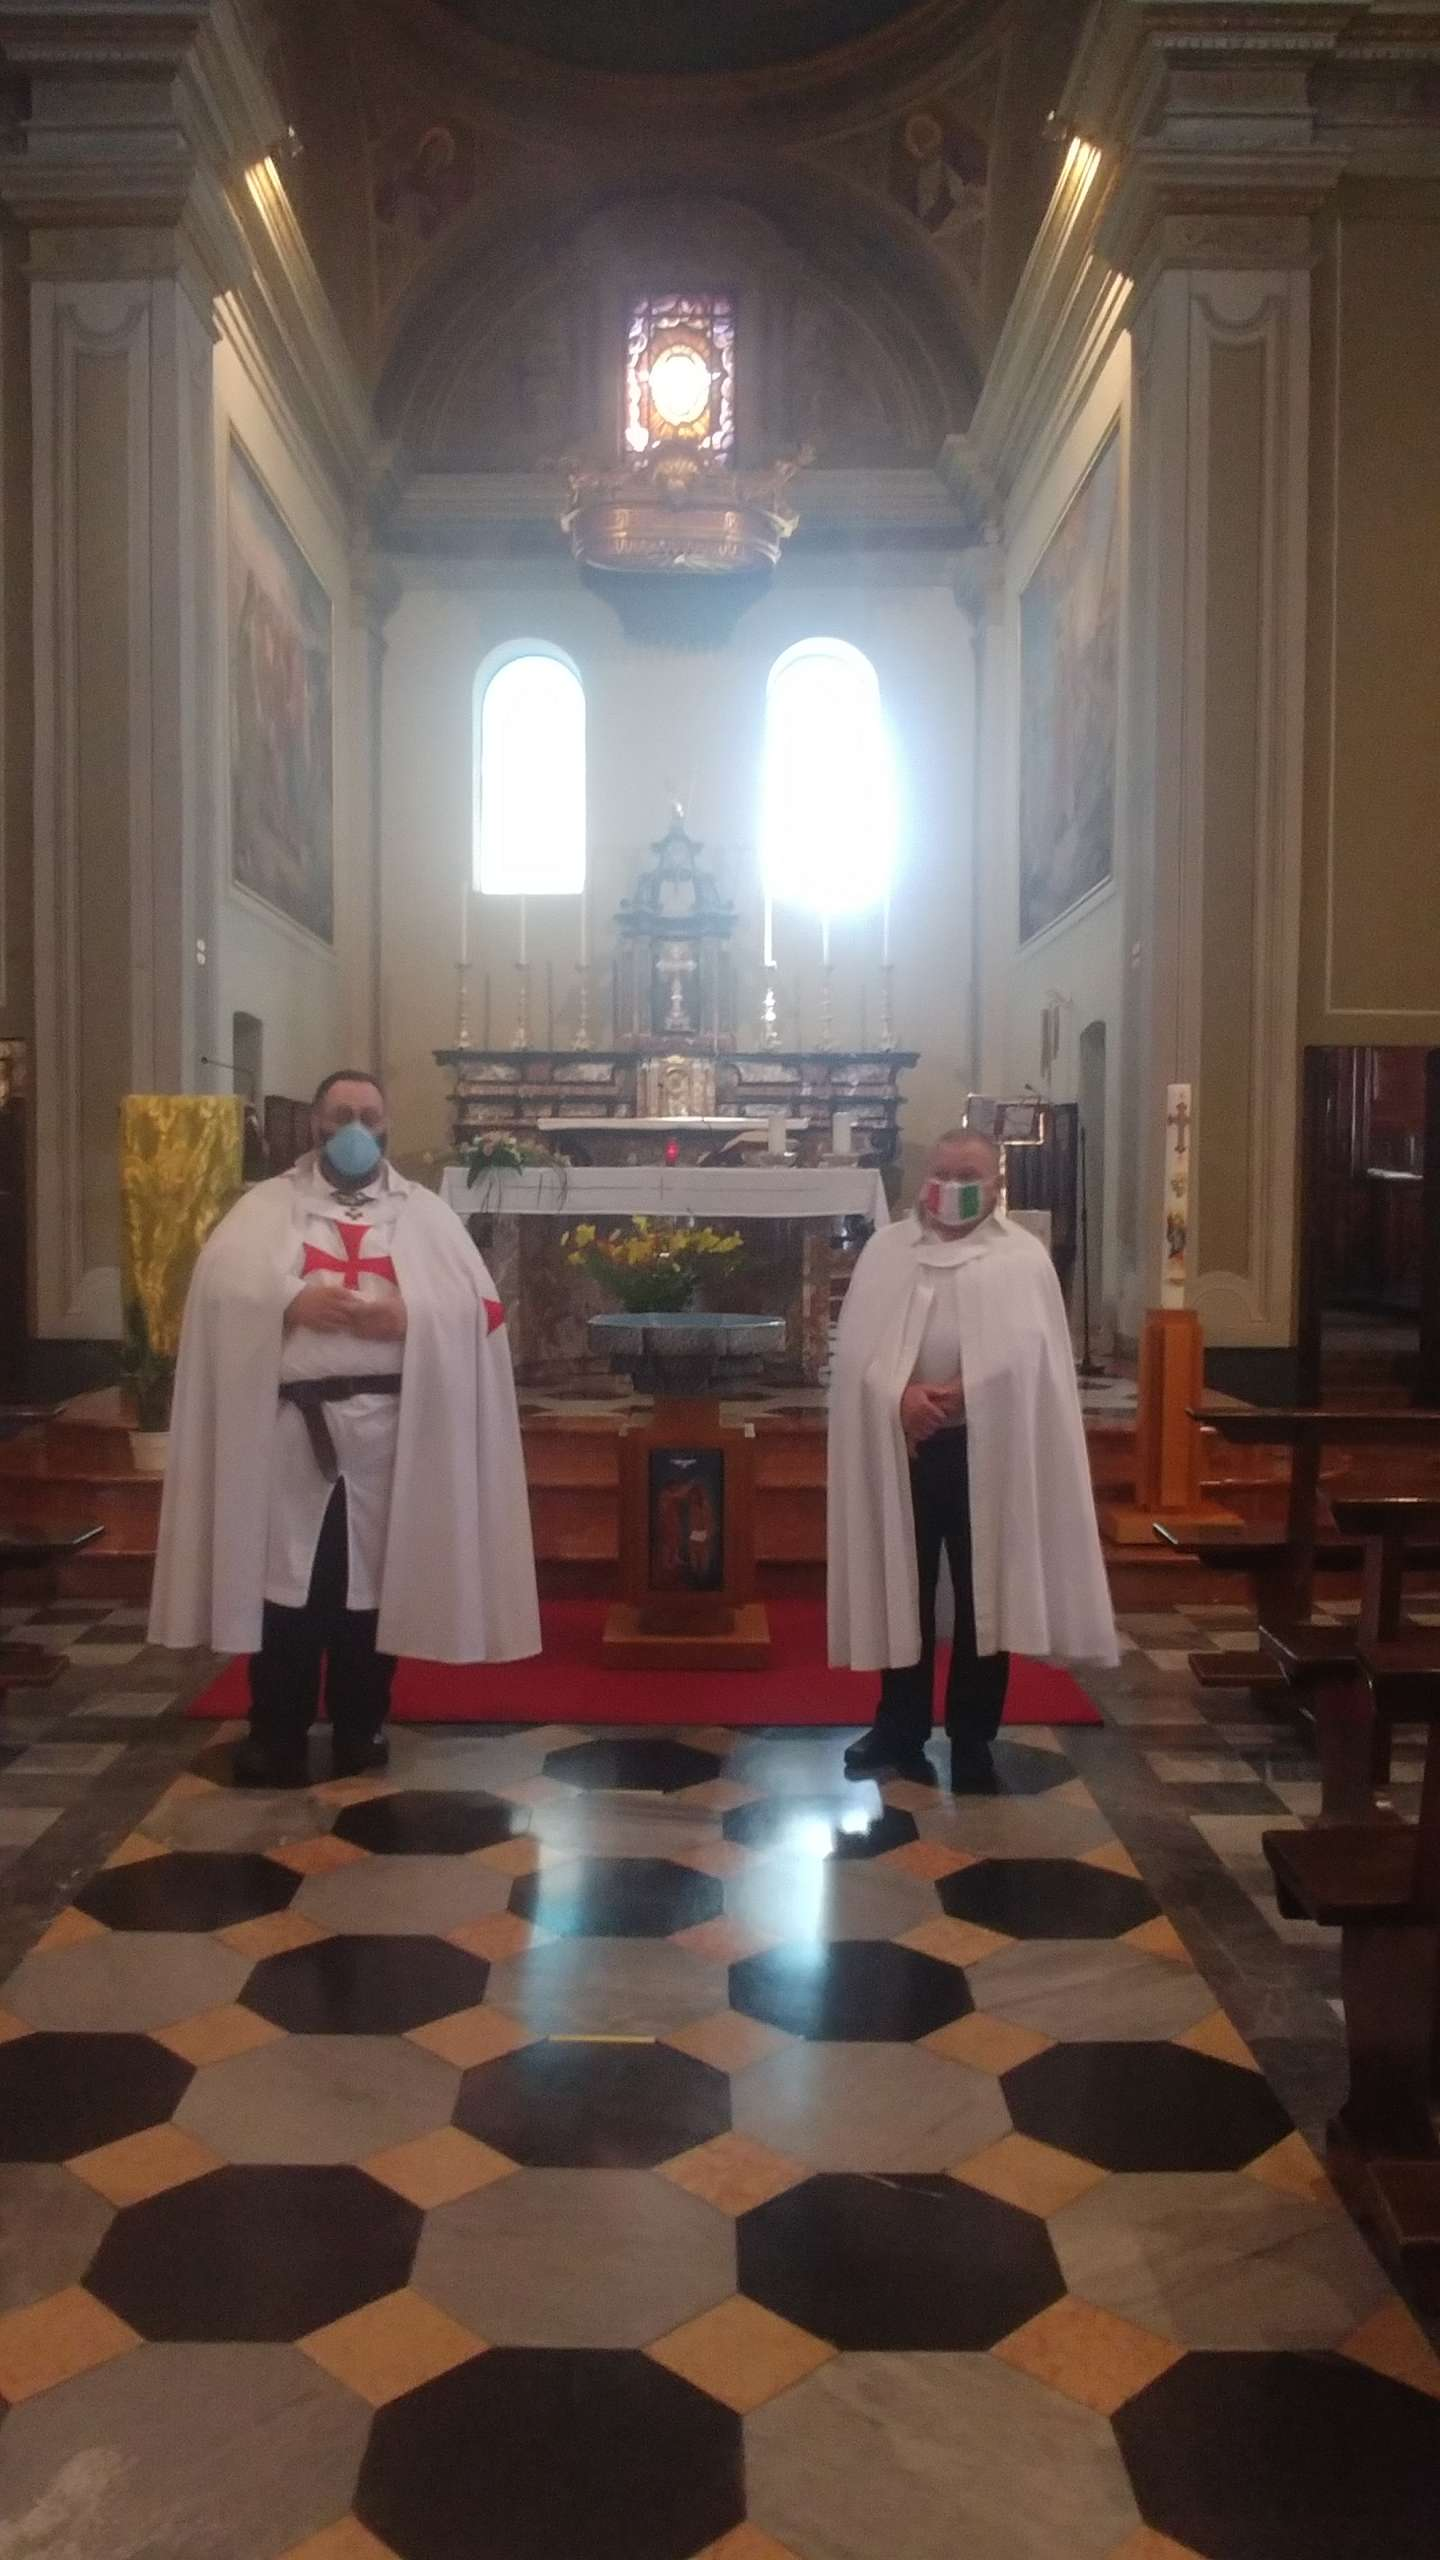 Teilnahme an der Heiligen Messe Kirche der Heiligen Peter und Paul 20 / 21.06.2020 Asnago di Cermenate (Como)